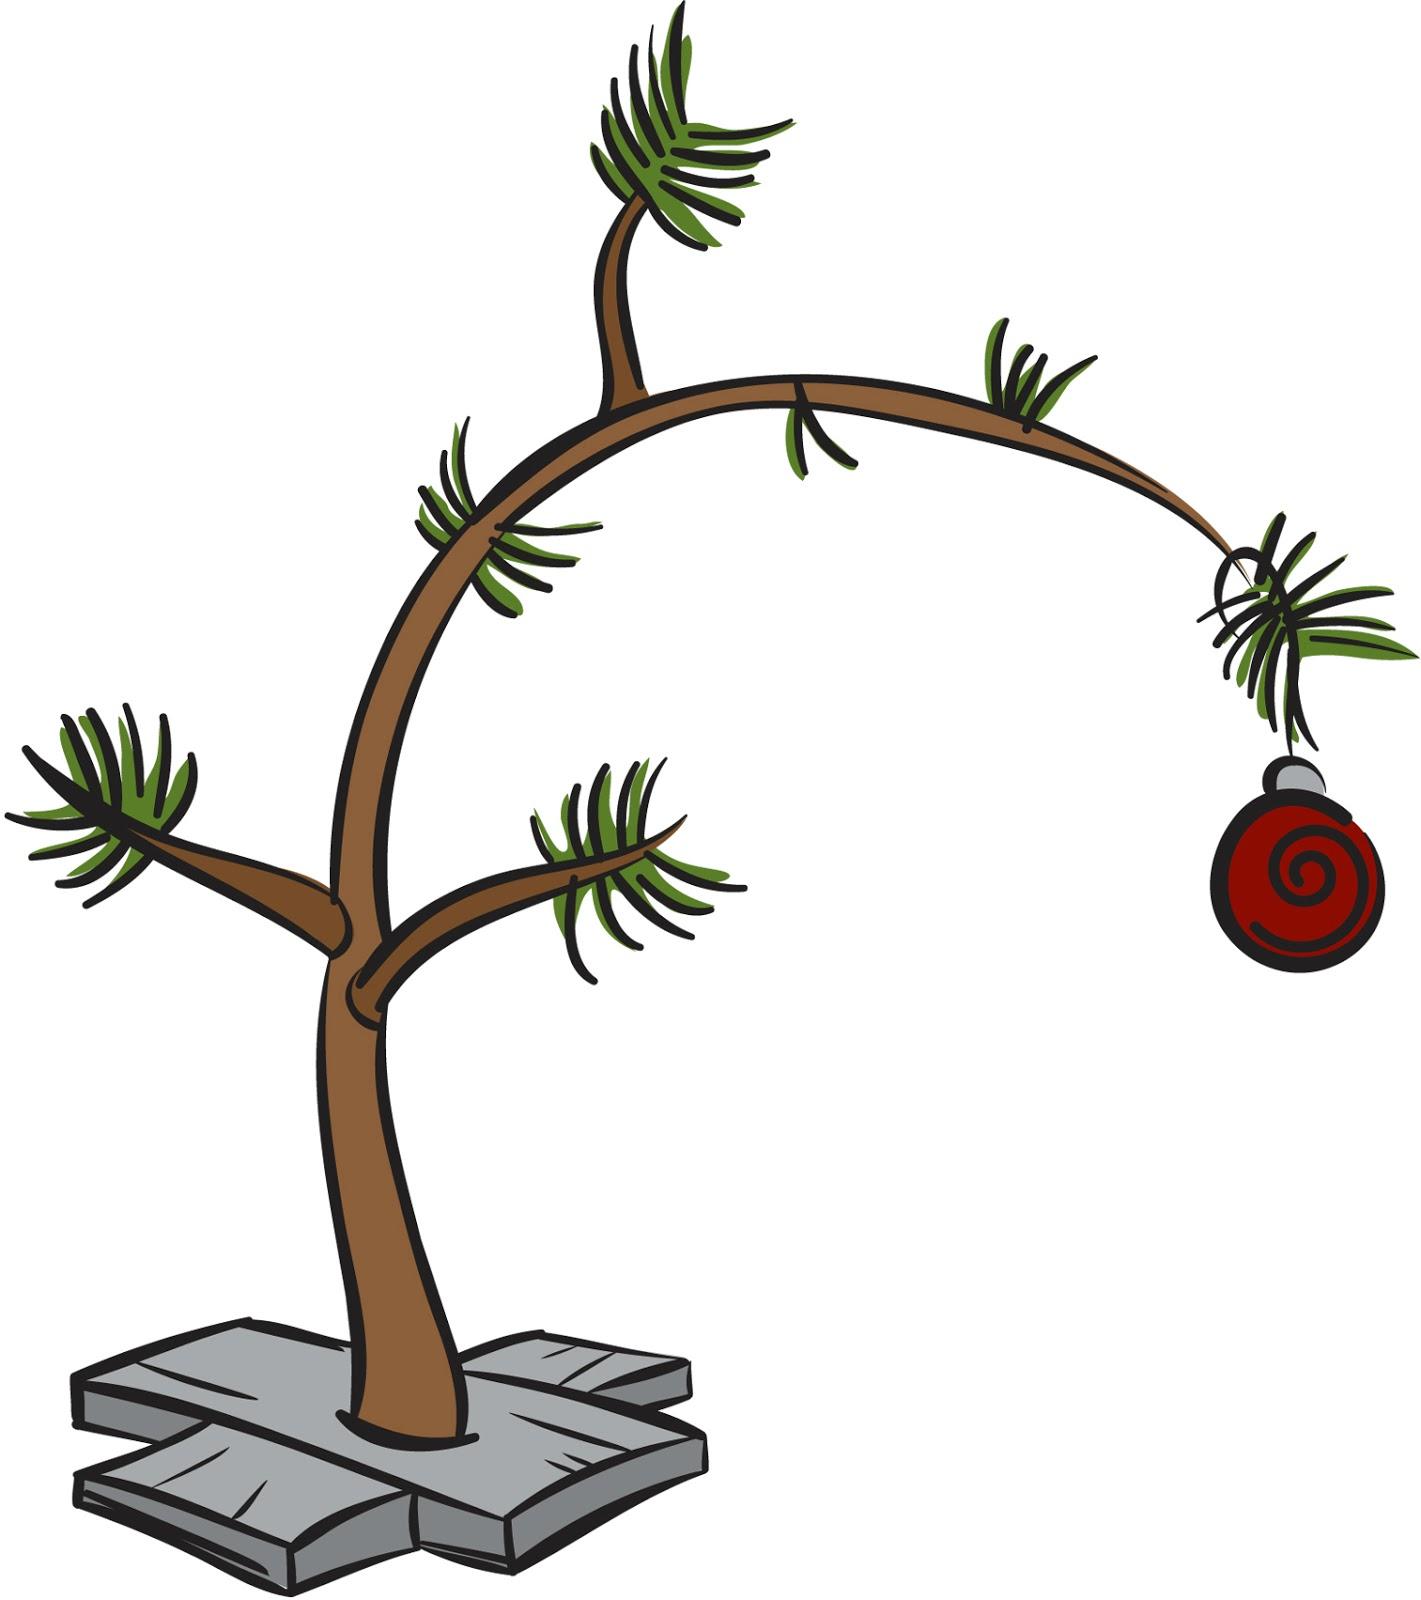 Charley Brown Christmas Tree: Charlie Brown Christmas Tree Drawing At GetDrawings.com